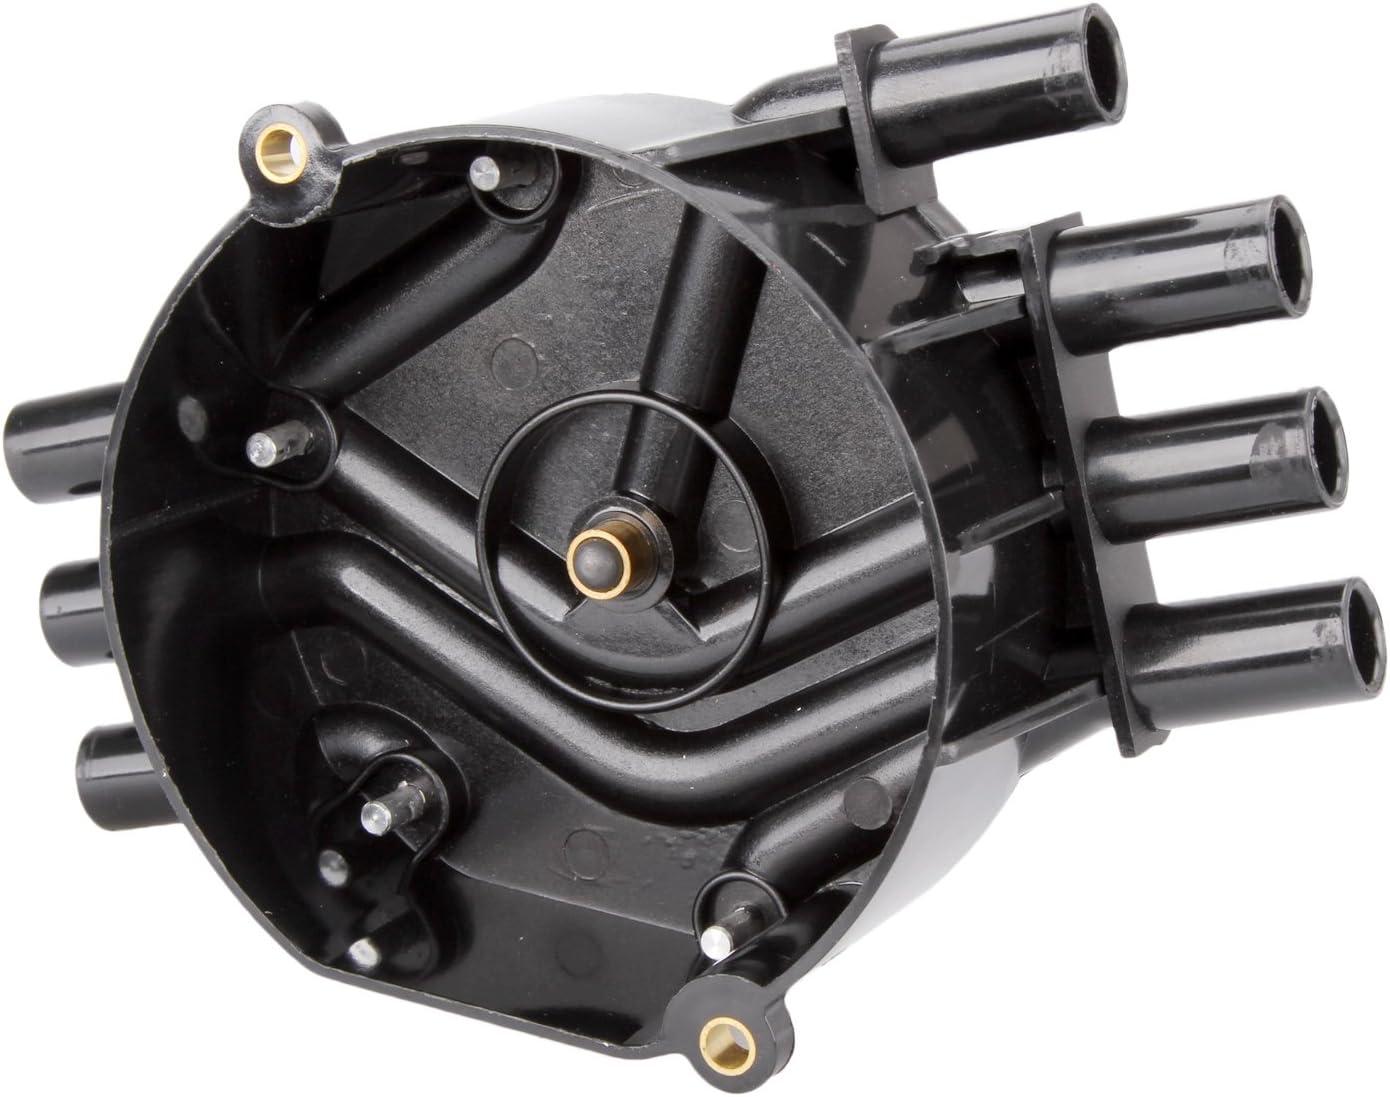 Dromedary OEM For Rotor D465 10452457 w//Distributor Cap 10452458 D328A Kit Set 4.3L